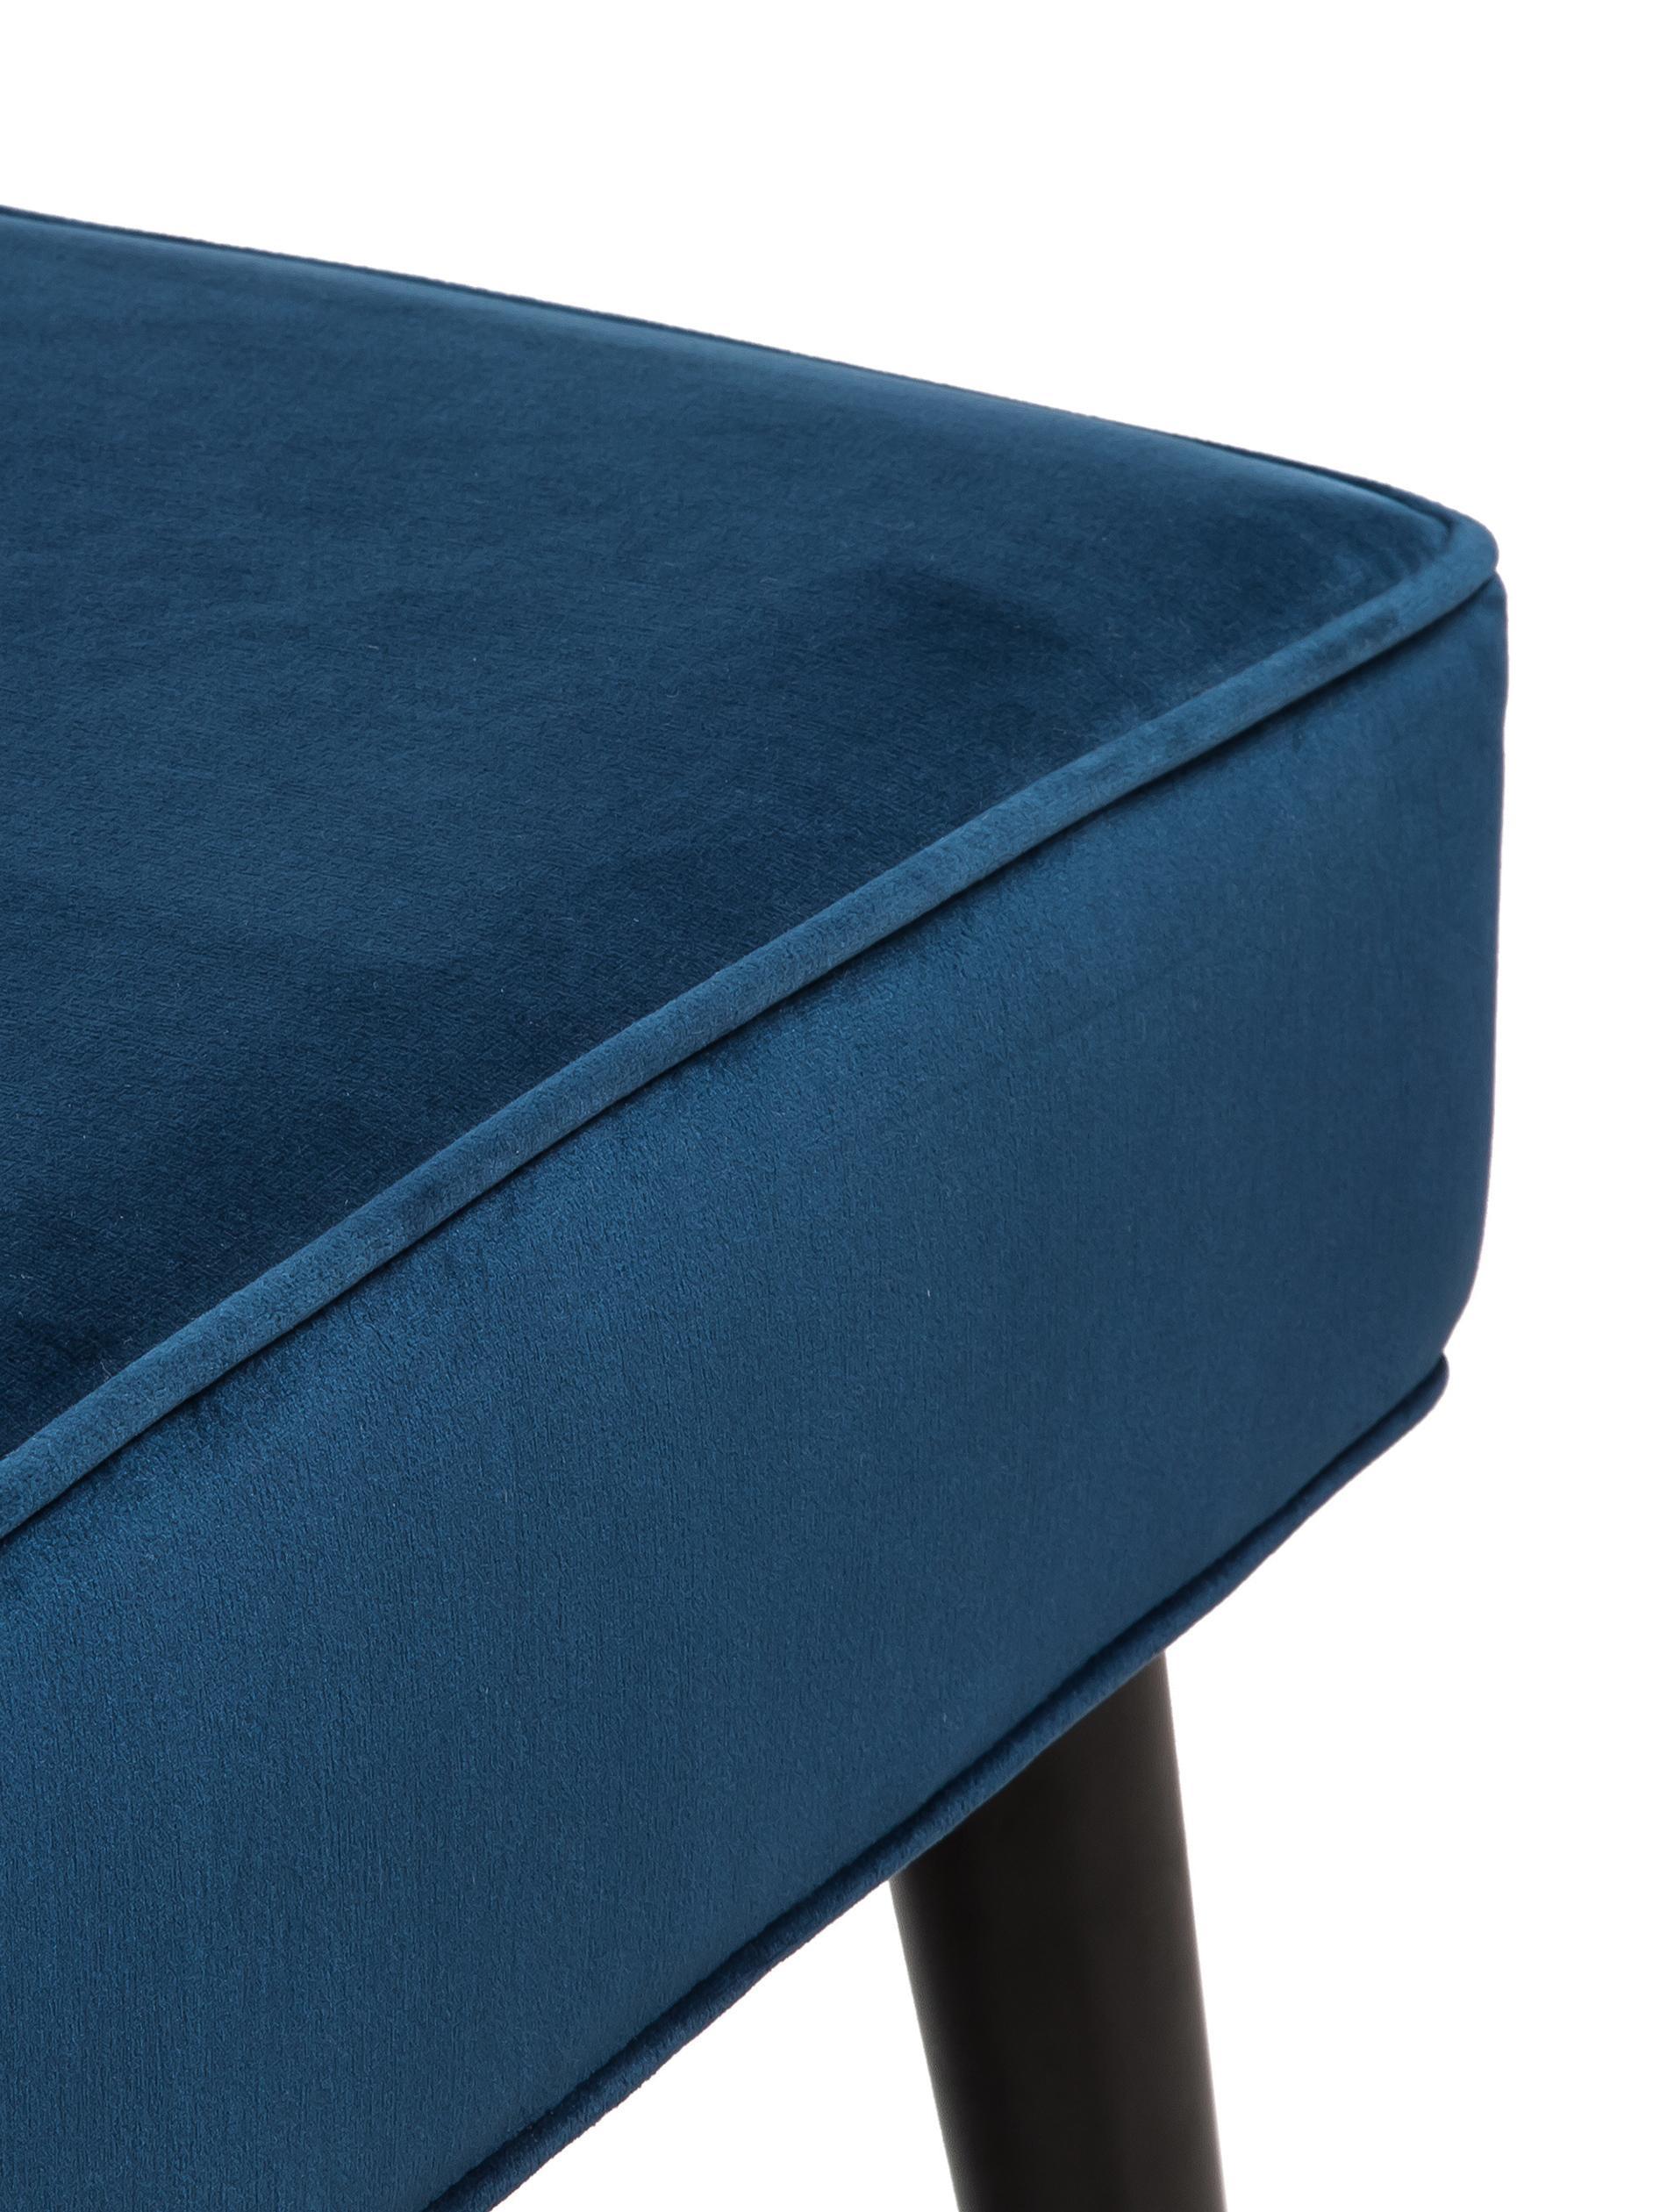 Samt-Sitzbank Beverly, Bezug: Samt (Polyester) 50.000 S, Gestell: Eukalyptusholz, Beine: Metall, pulverbeschichtet, Dunkelblau, B 110 x H 46 cm